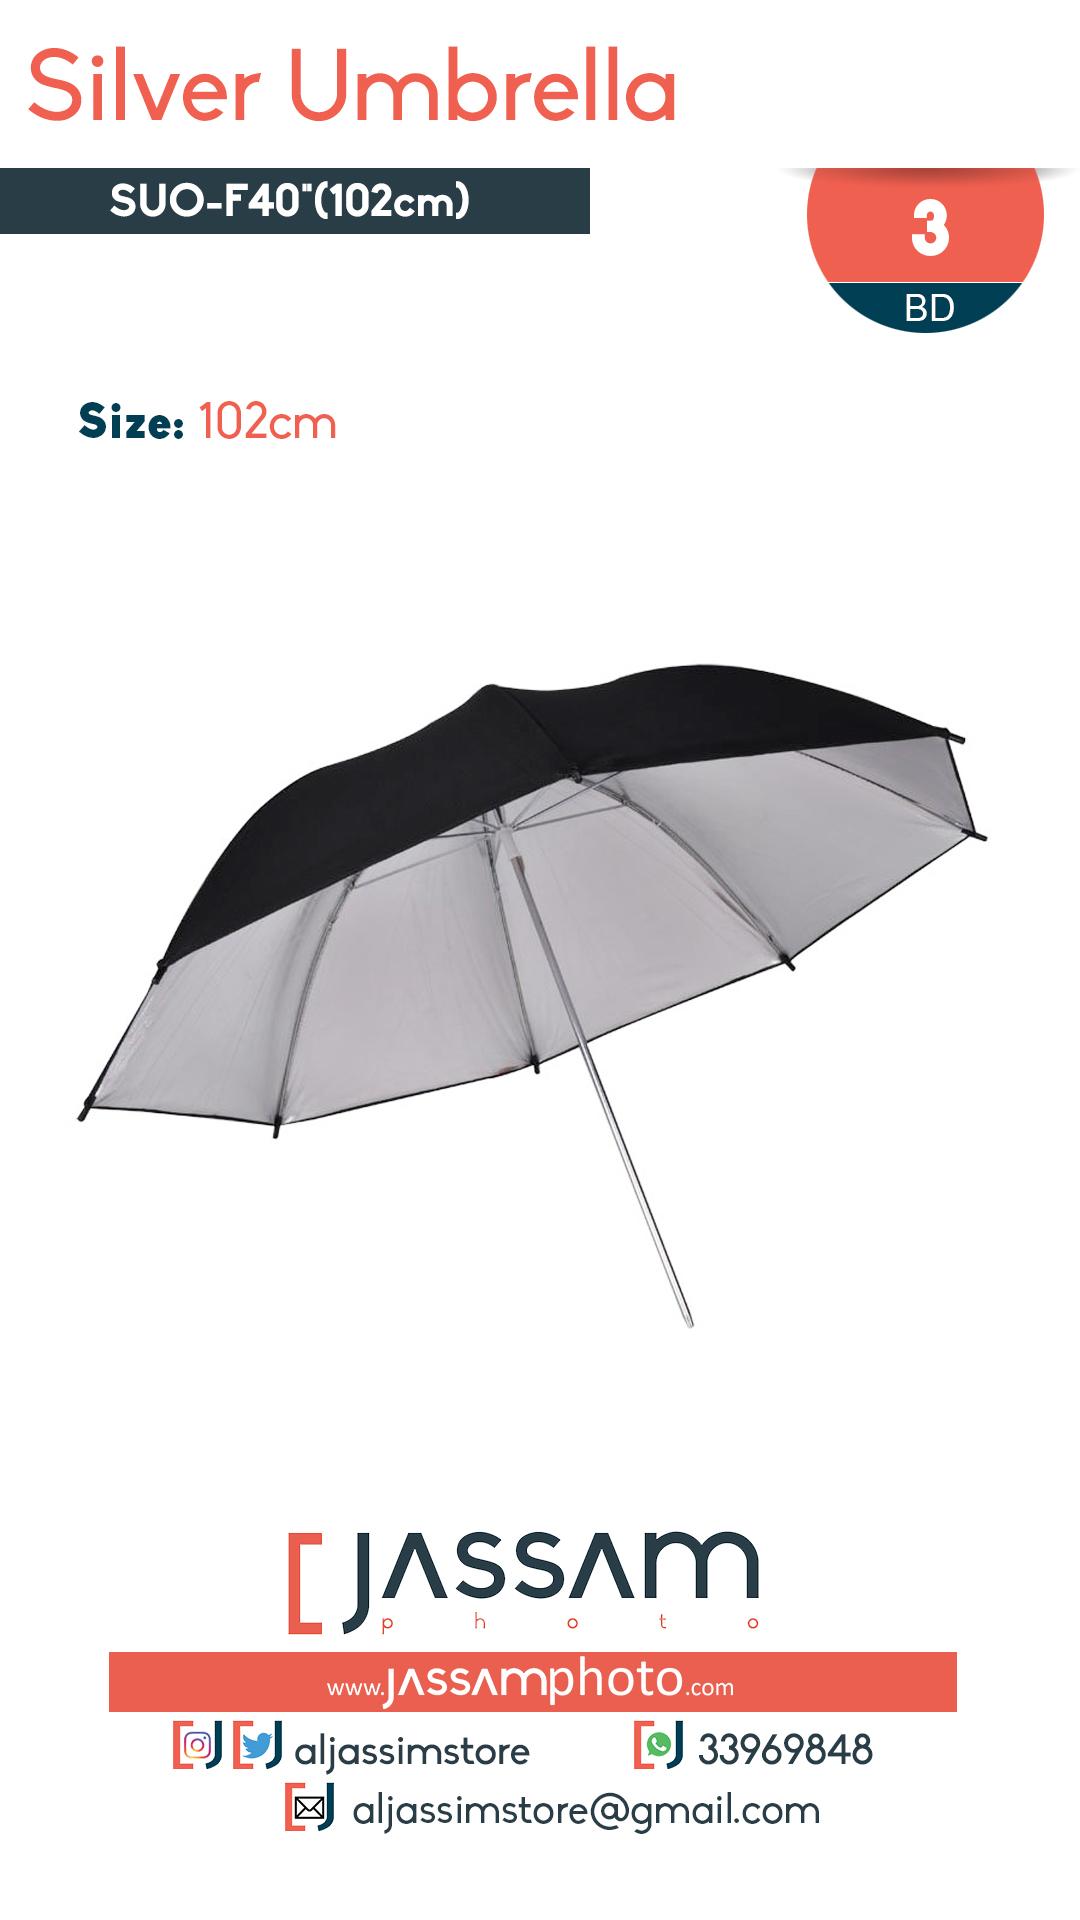 Silver Umbrella 102cm